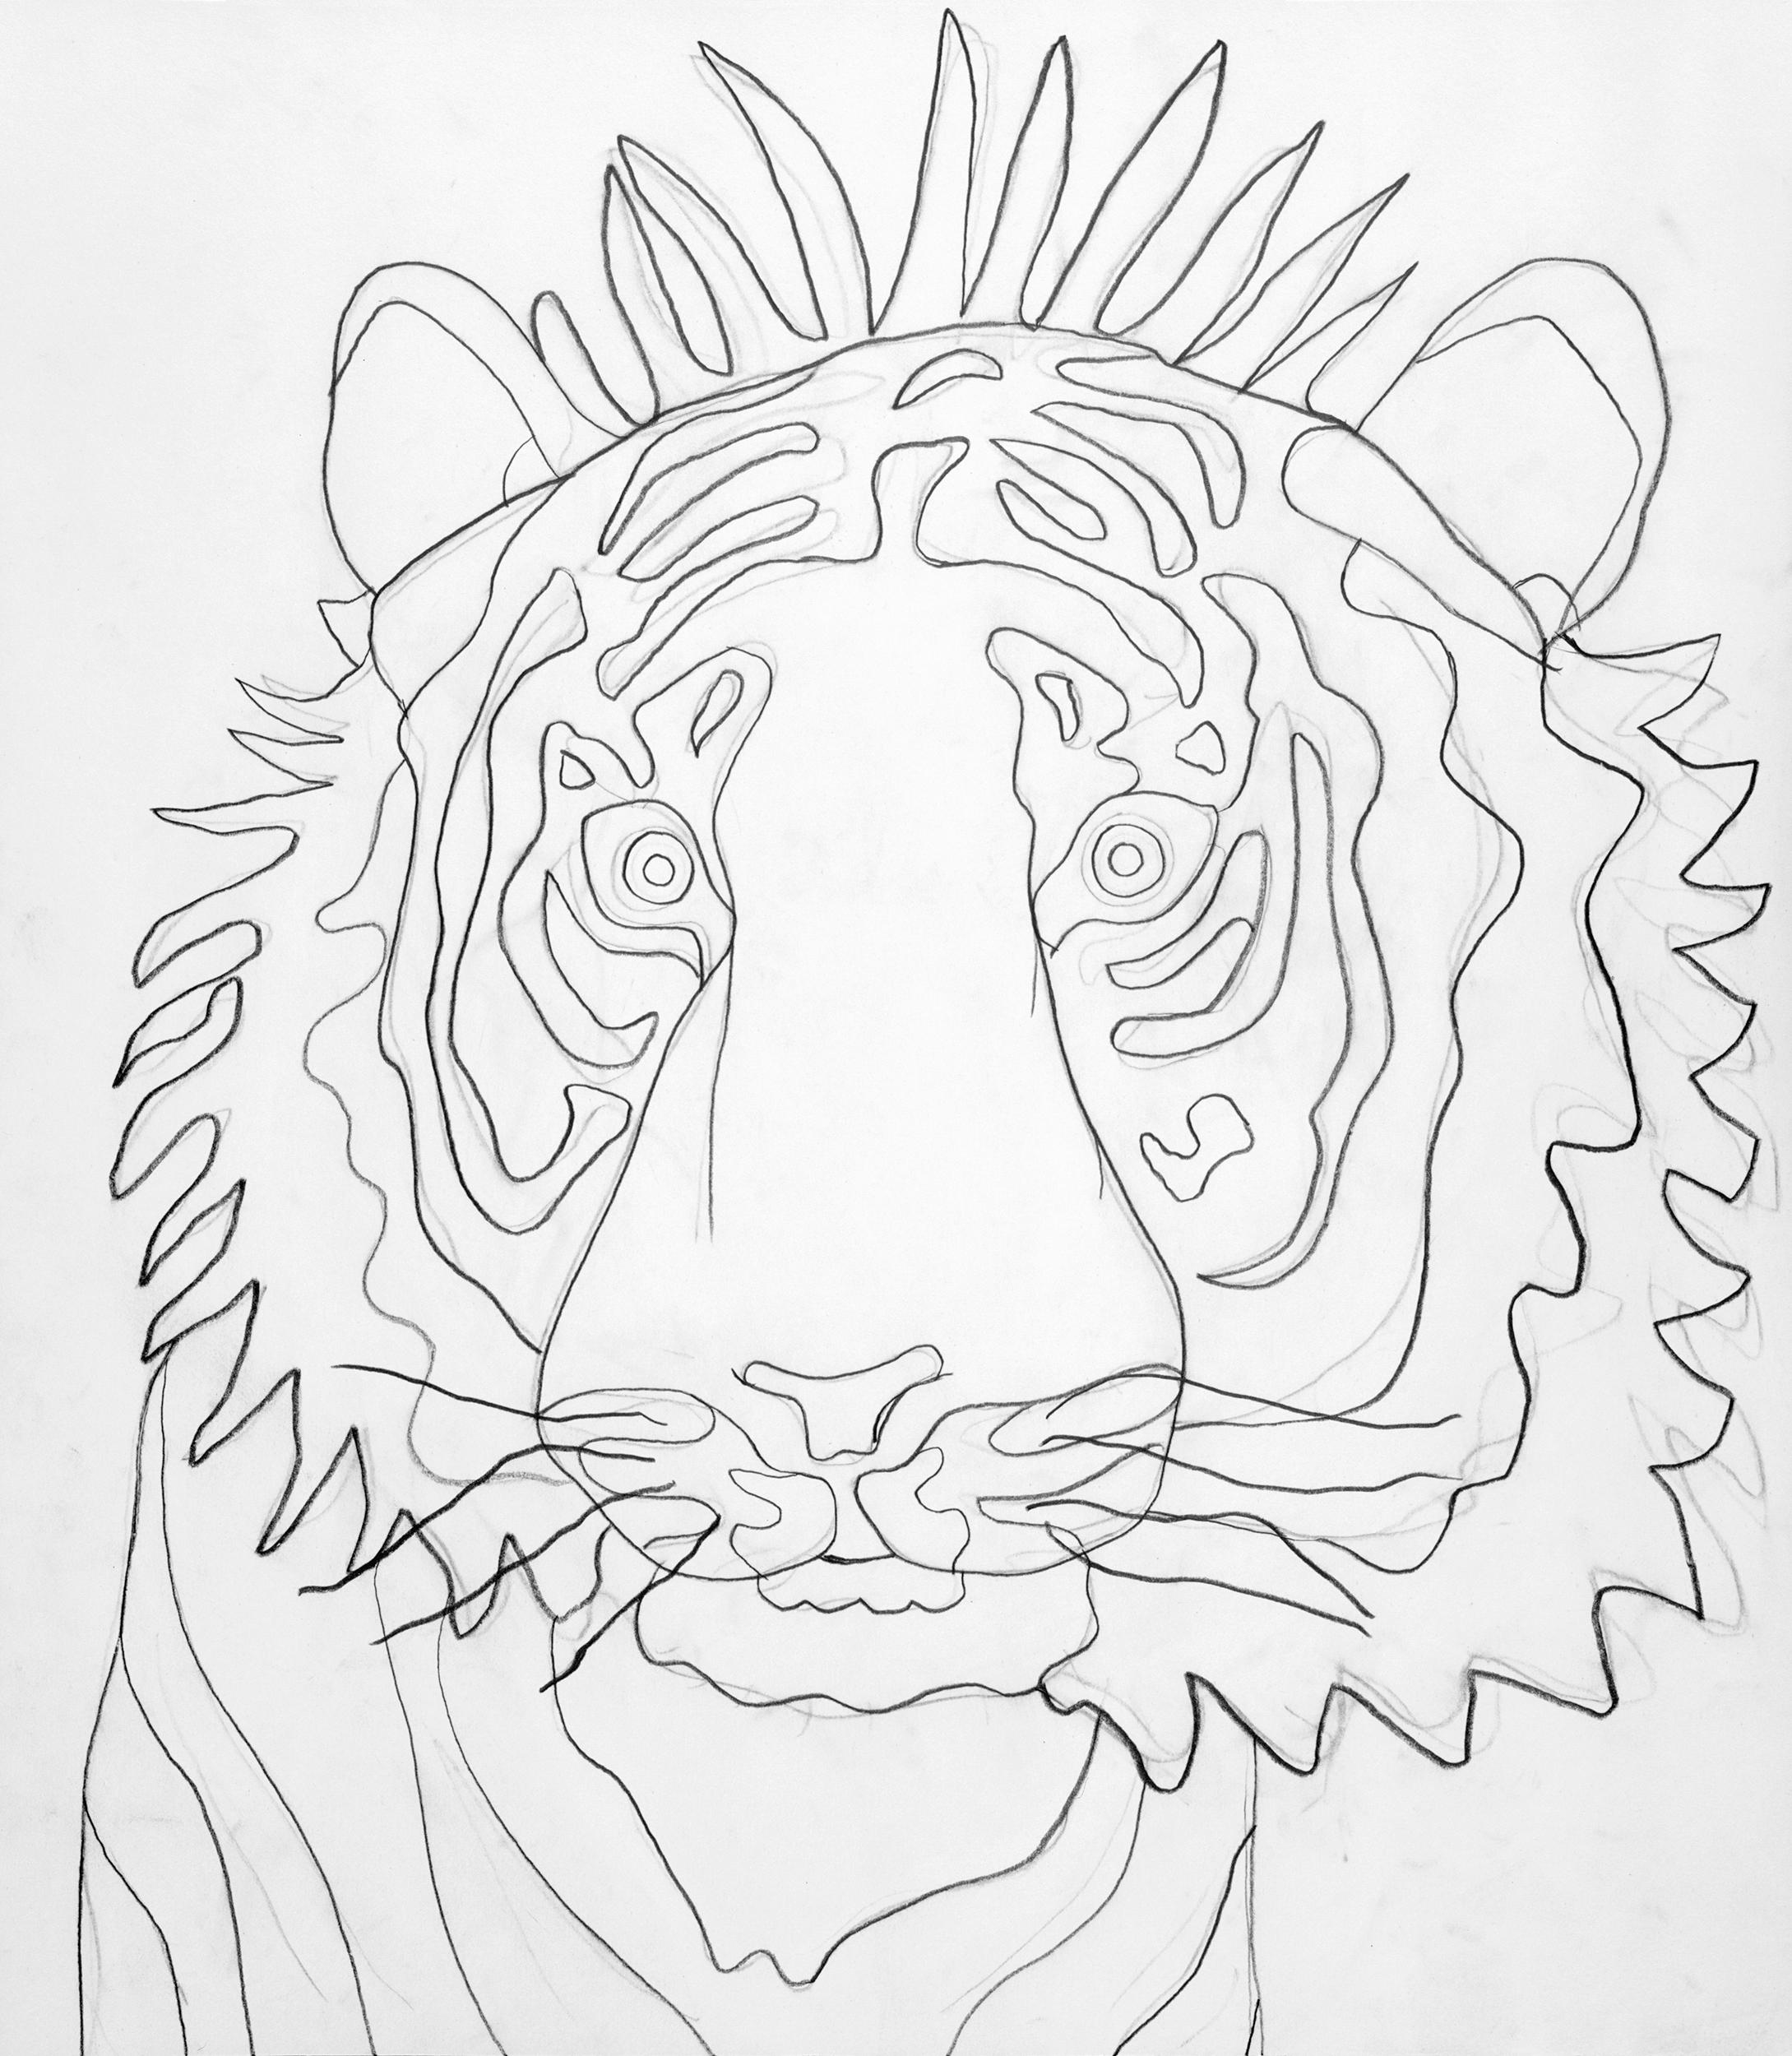 Tiger III, drawing by Wouter van Riessen